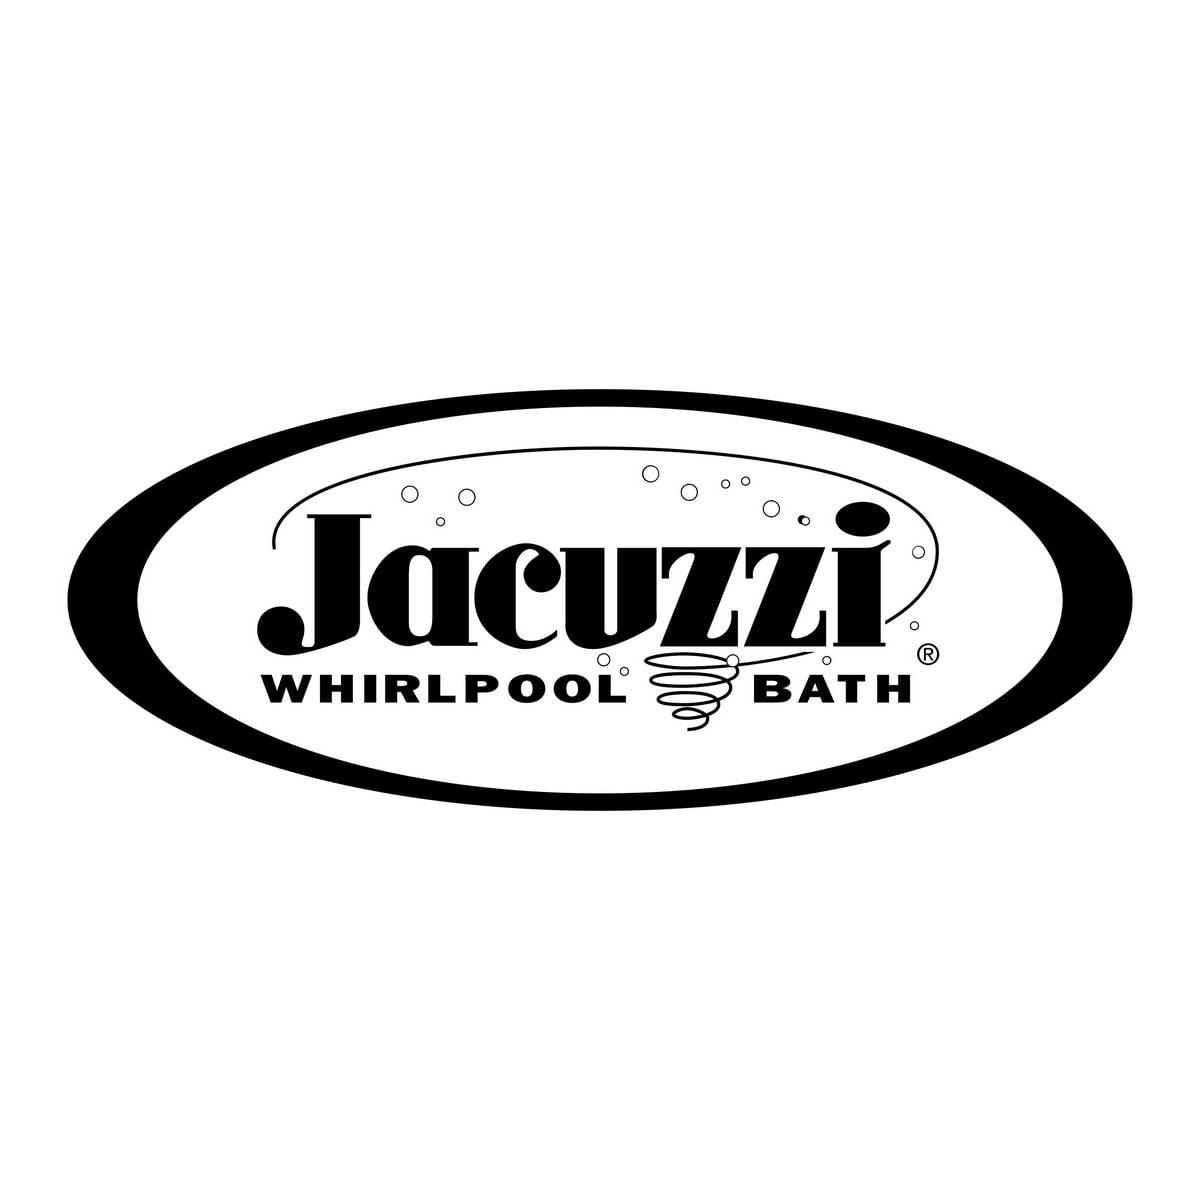 Marketing Mix Of Jacuzzi - Jacuzzi Marketing Mix and 4 P\'s of marketing